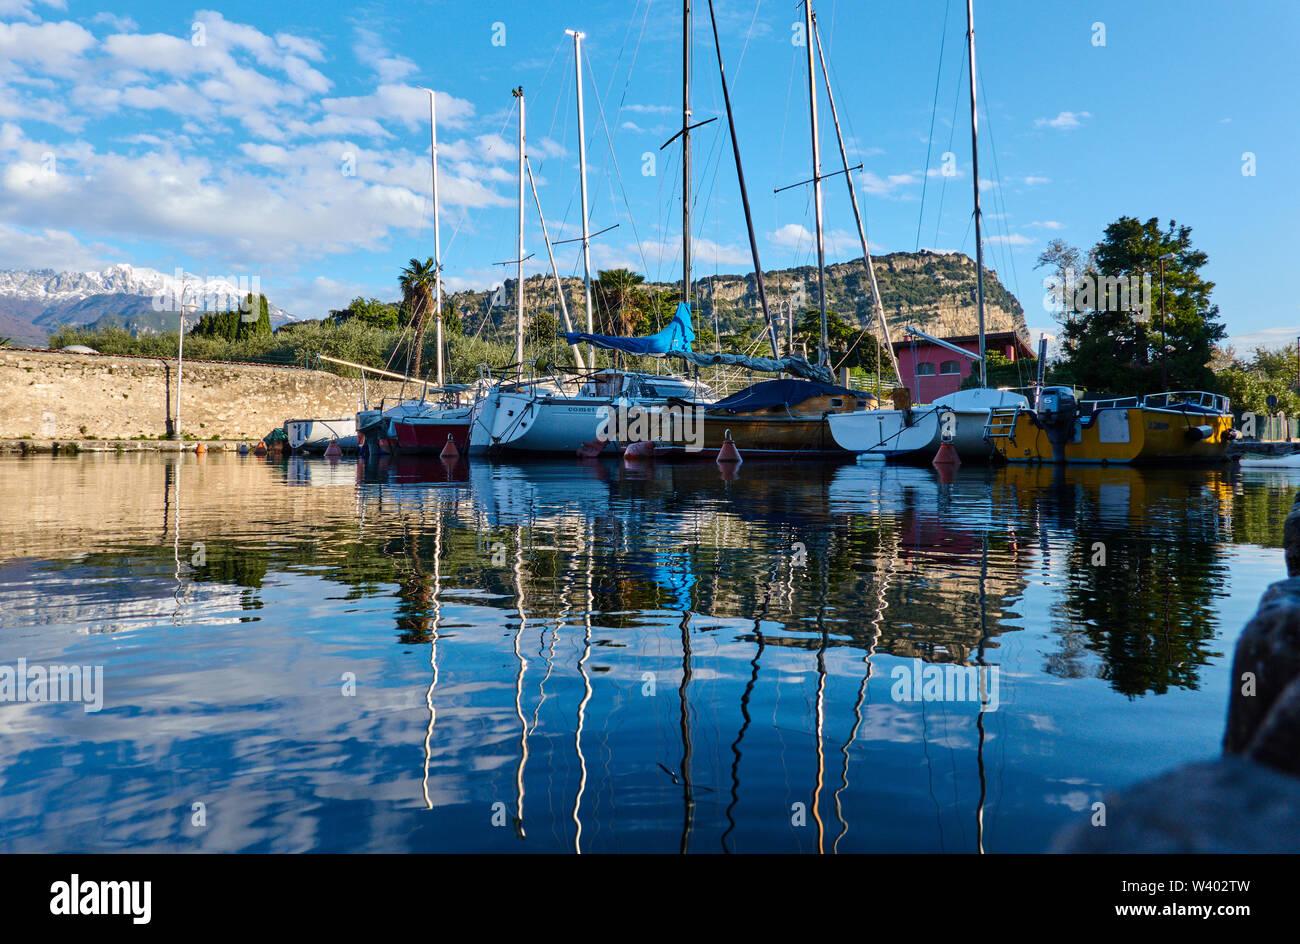 Small harbor Porticcioloat Lago di Garda, Lake Garda in Torbole - Nago, Riva, Trentino , Italy at April 15, 2019. © Peter Schatz / Alamy Stock Photos - Stock Image